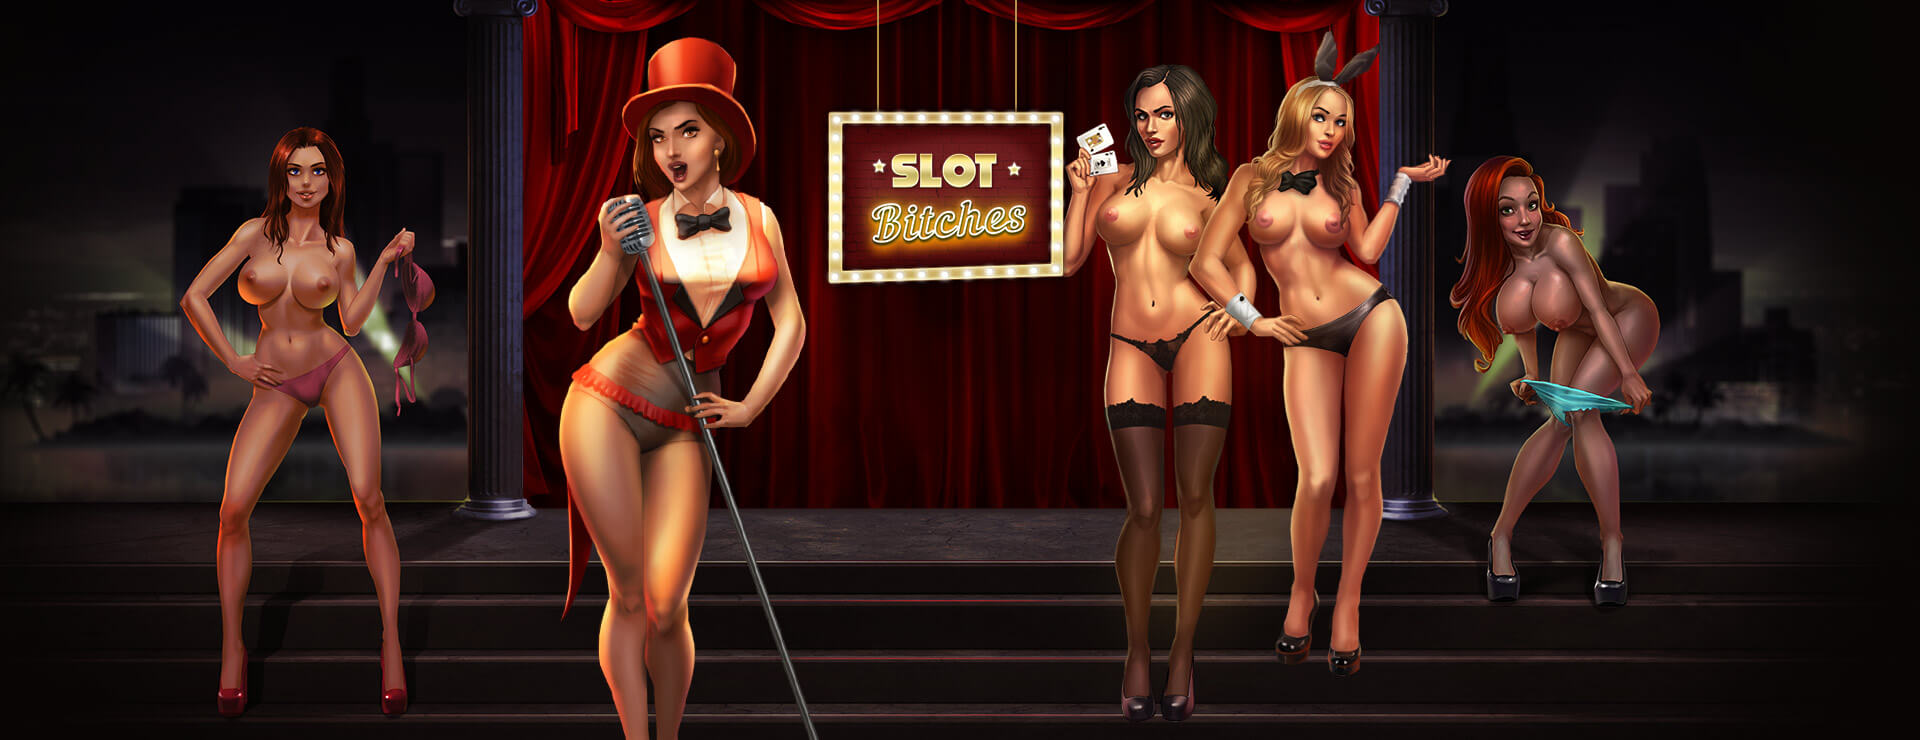 Slot Bitches - Casino Game